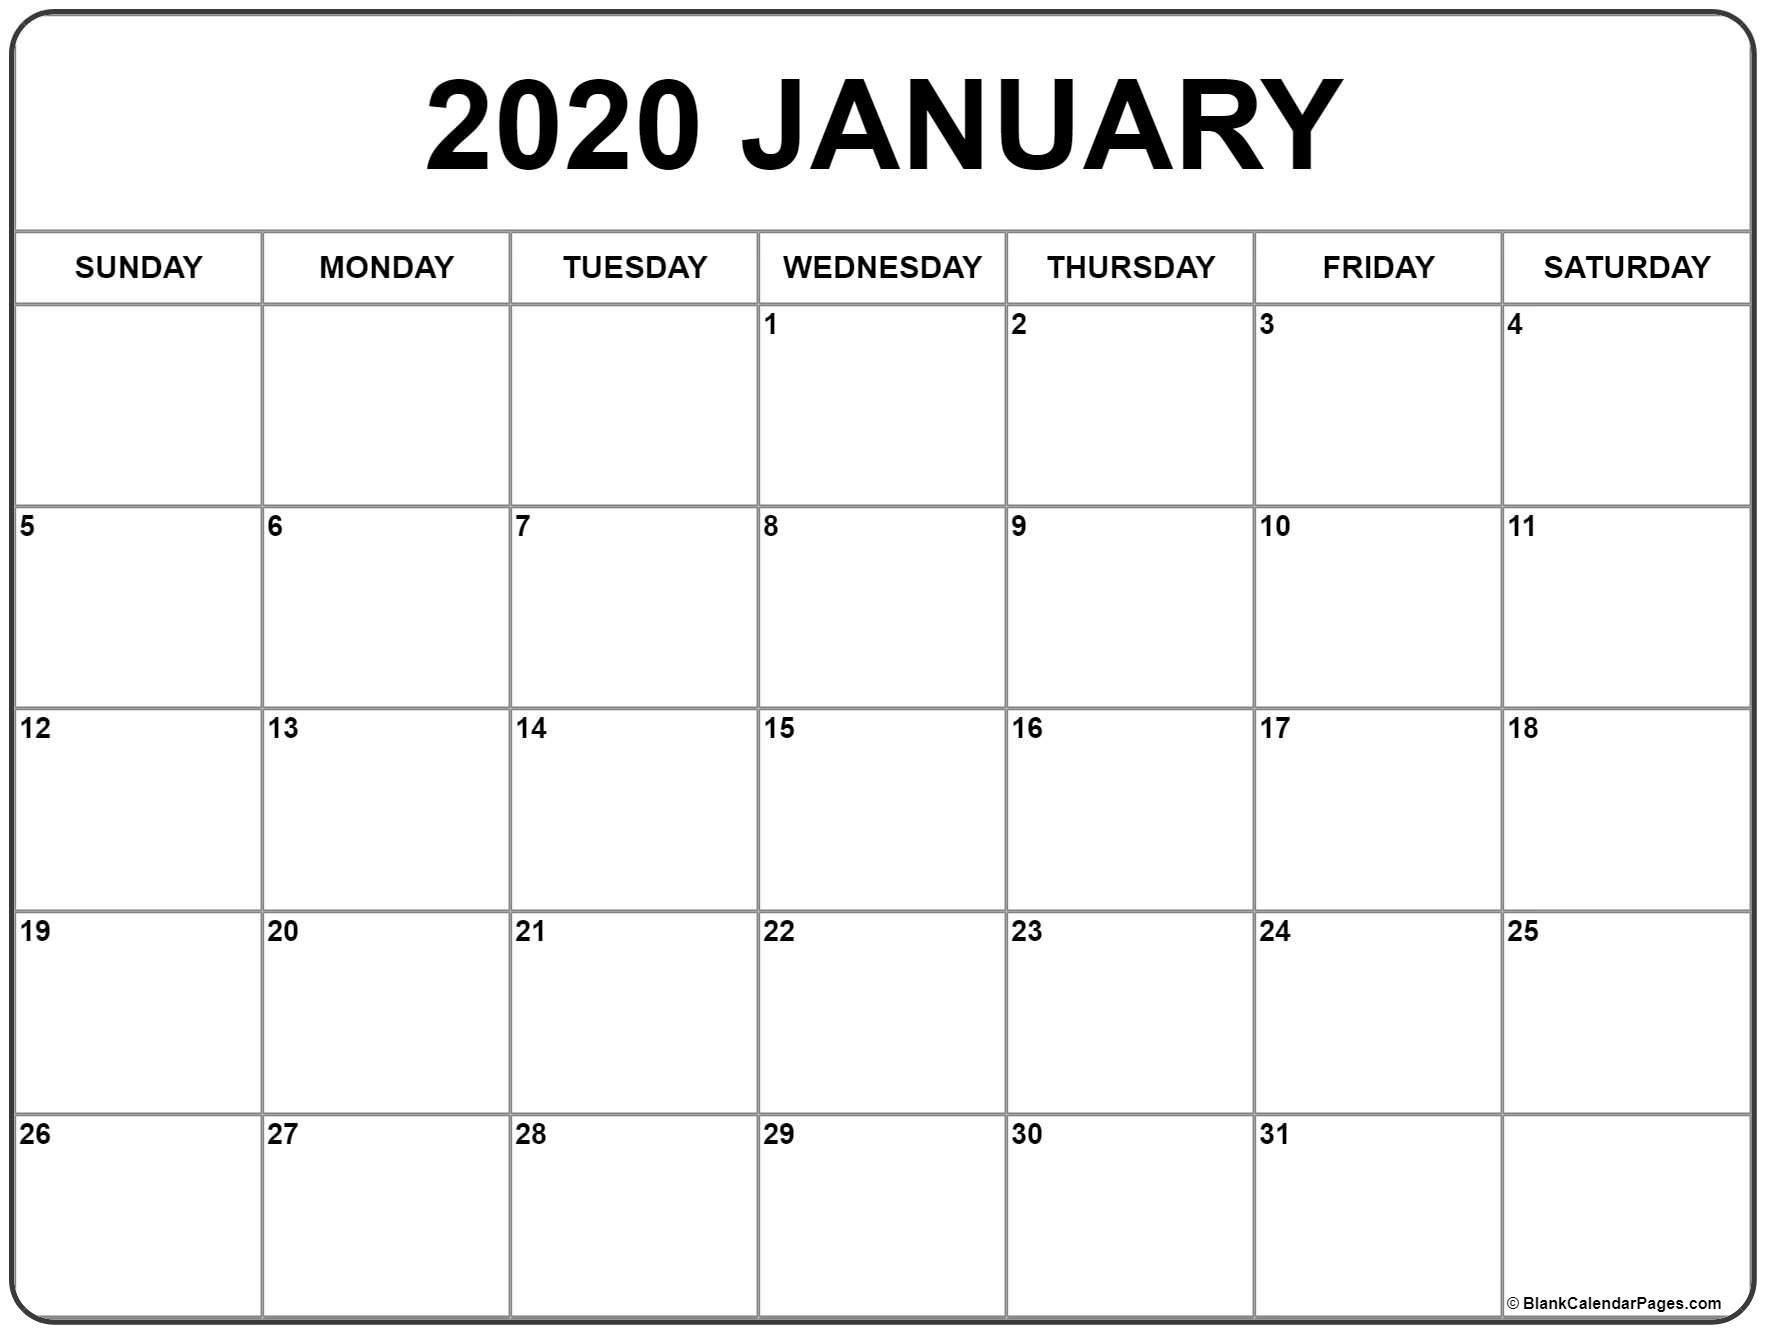 January 2020 Calendar   Free Printable Monthly Calendars-January 2020 Printable Calendar With Holidays